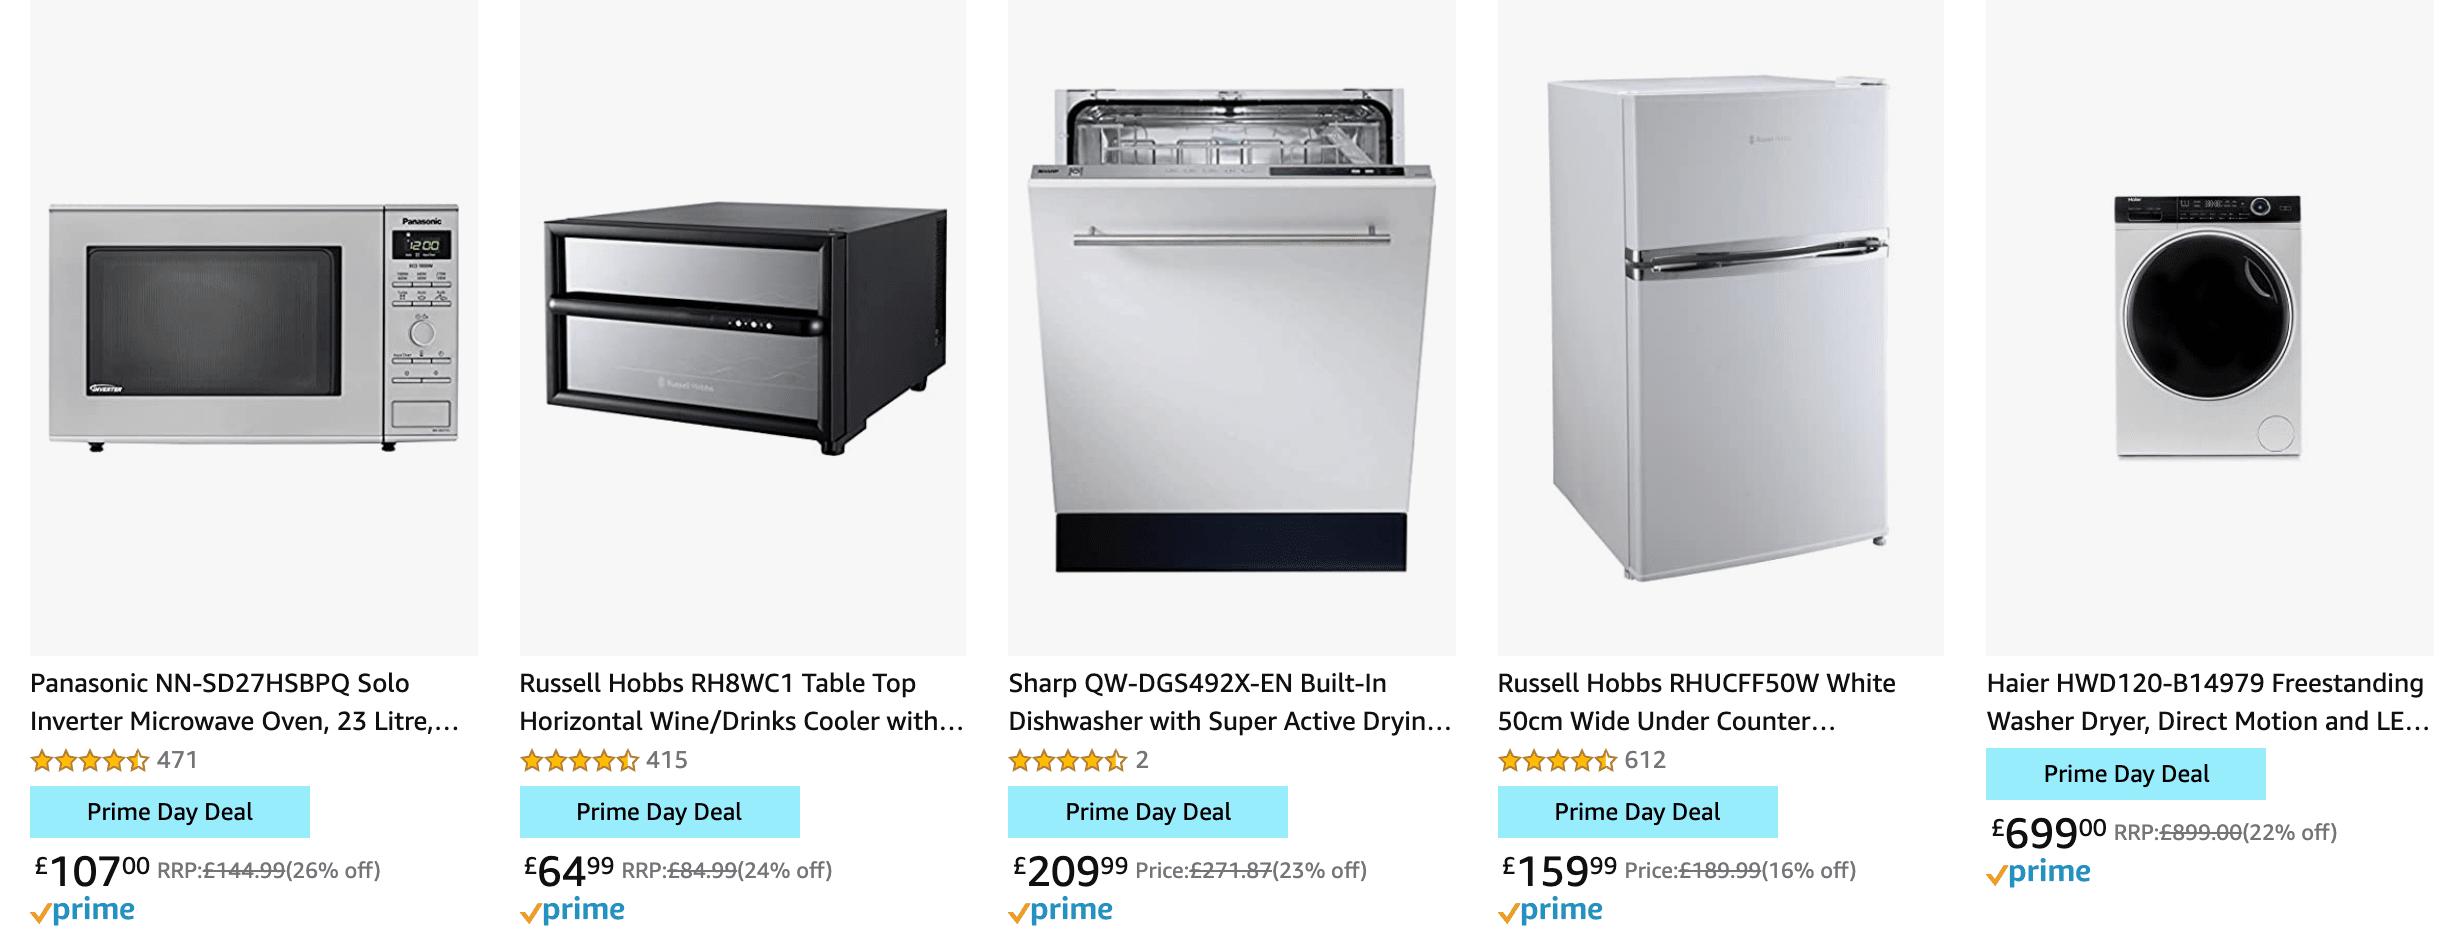 Large Appliances Amazon Prime Day